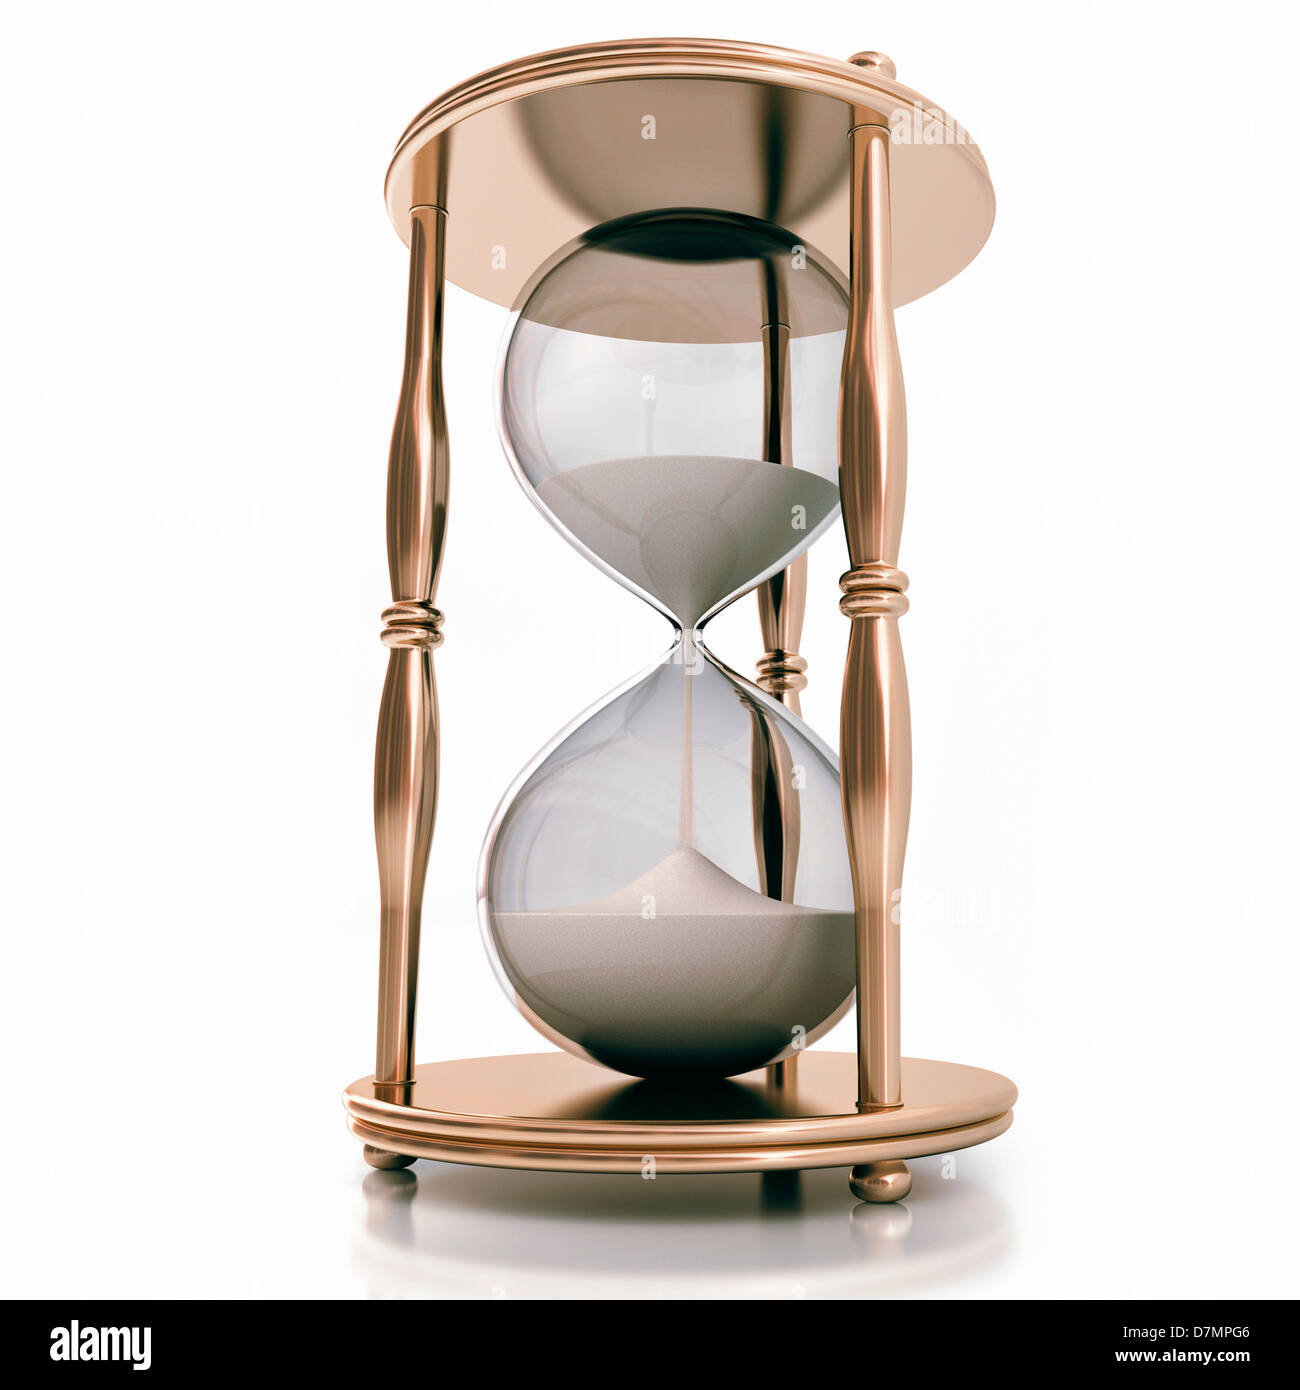 Hourglass, artwork - Stock Image